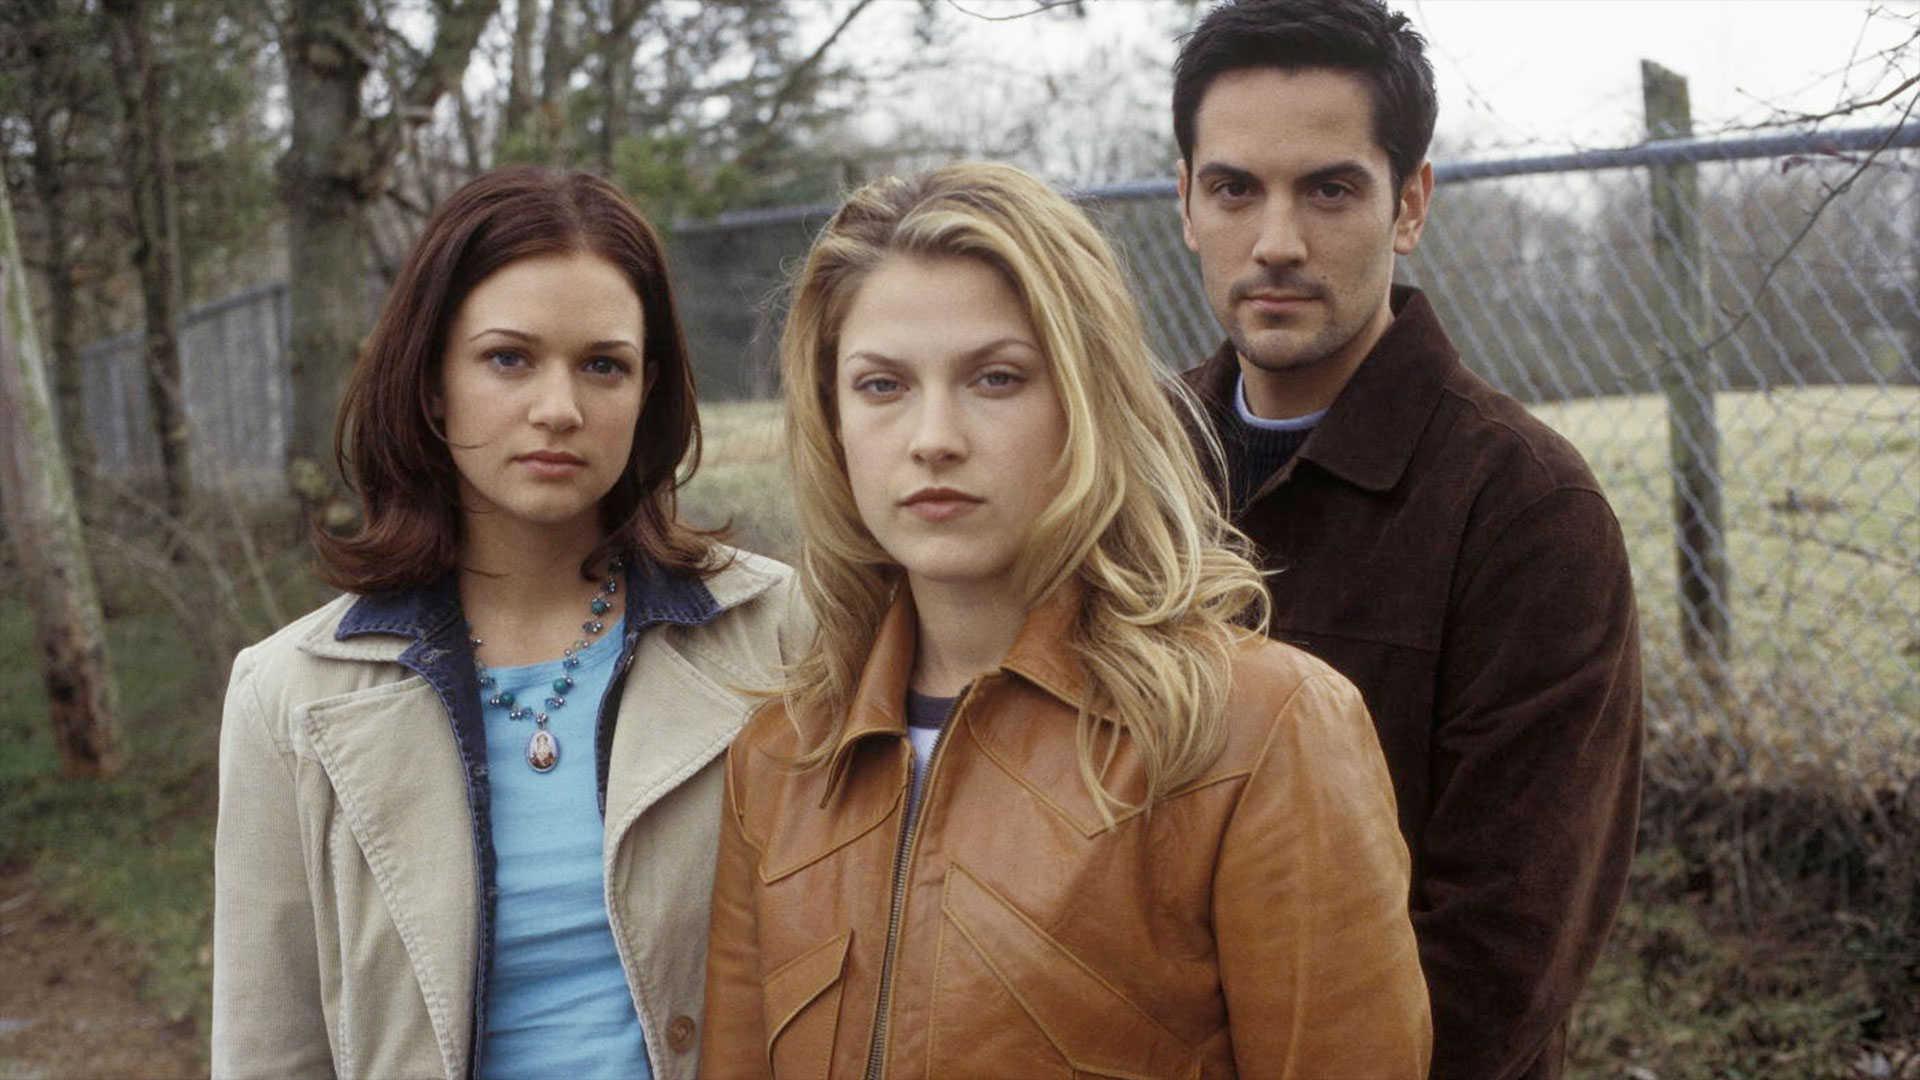 A.J. Cook, Ali Larter and Michael Landes in Final Destination 2 (2003)